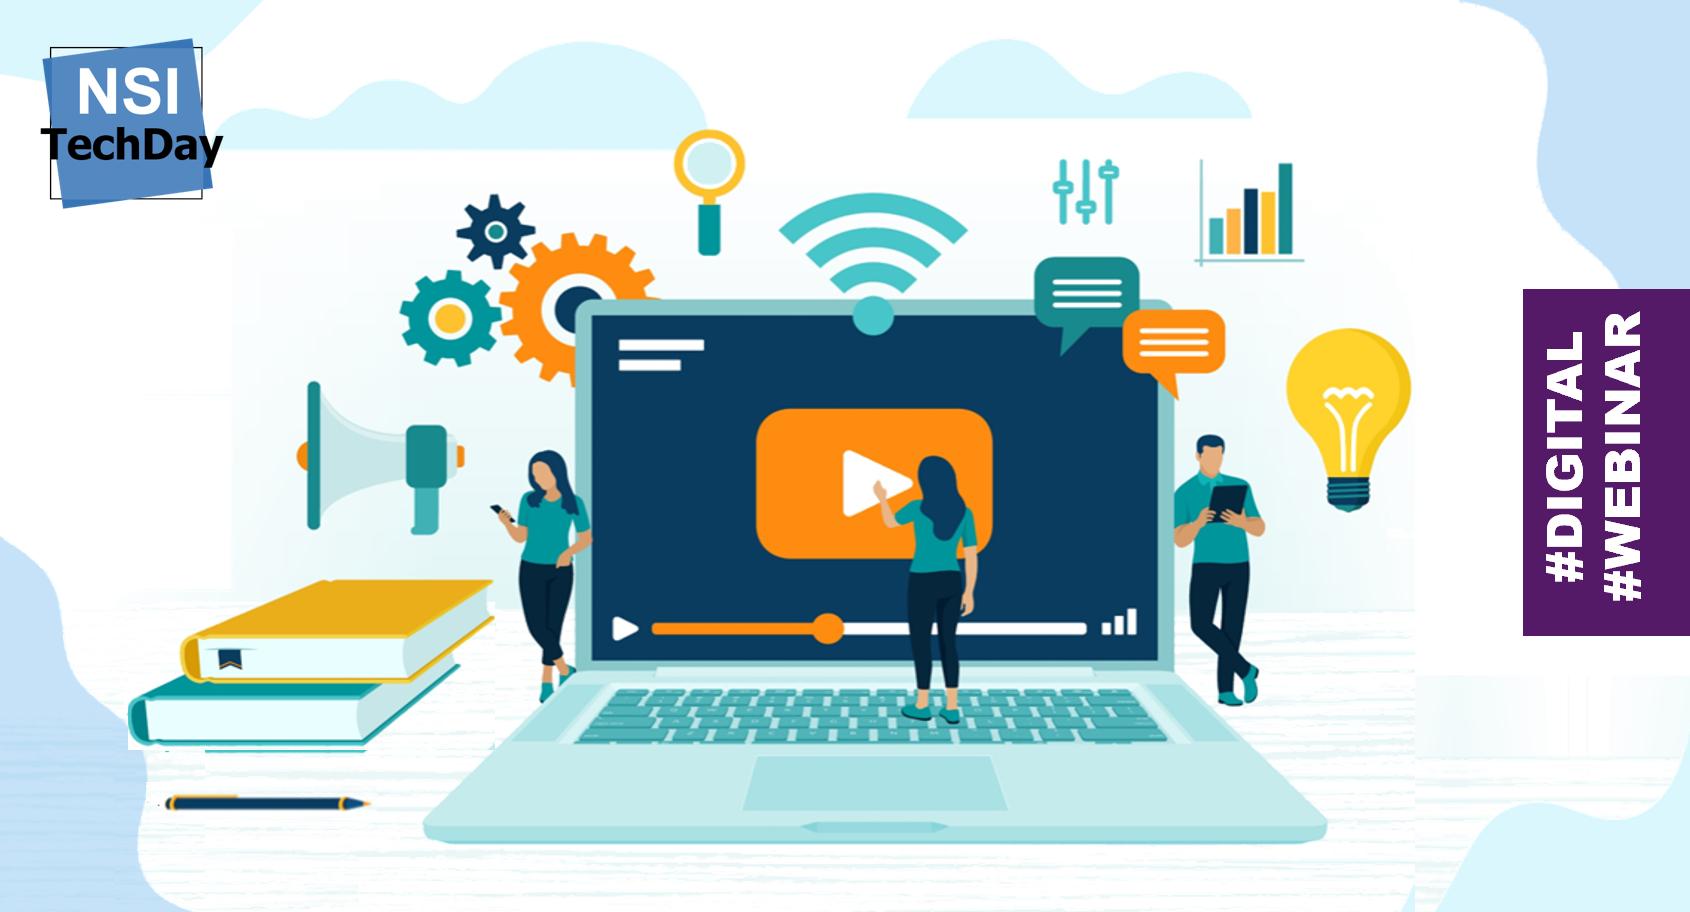 NSI Techday 2020 - 6 octobre 2020 - Digital Event